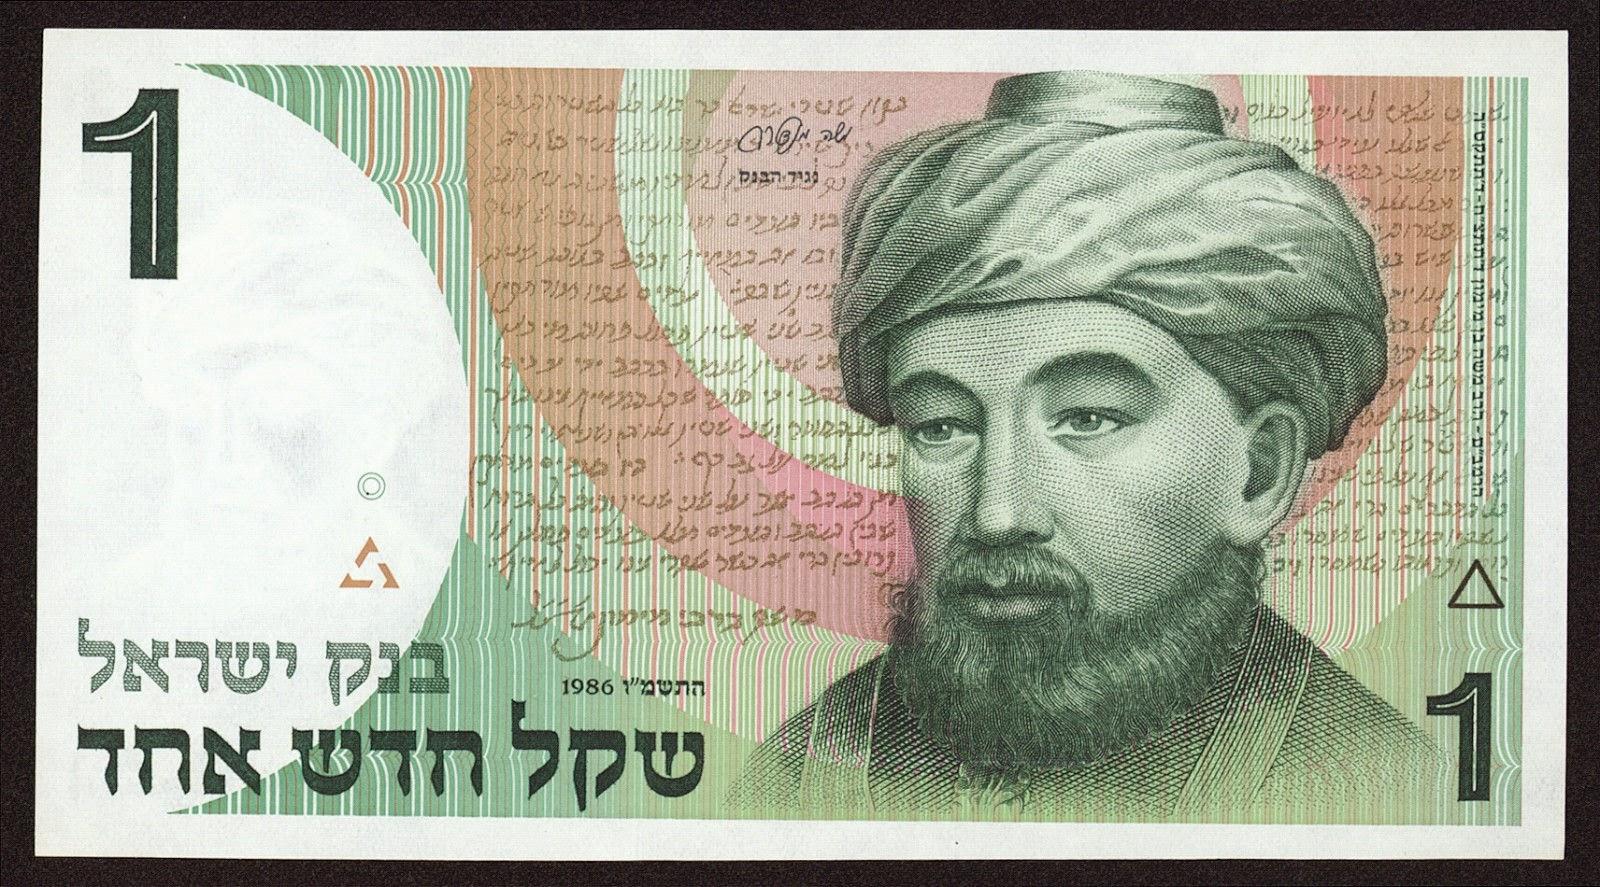 Israel banknotes 1 New Shekel note 1986 Maimonides